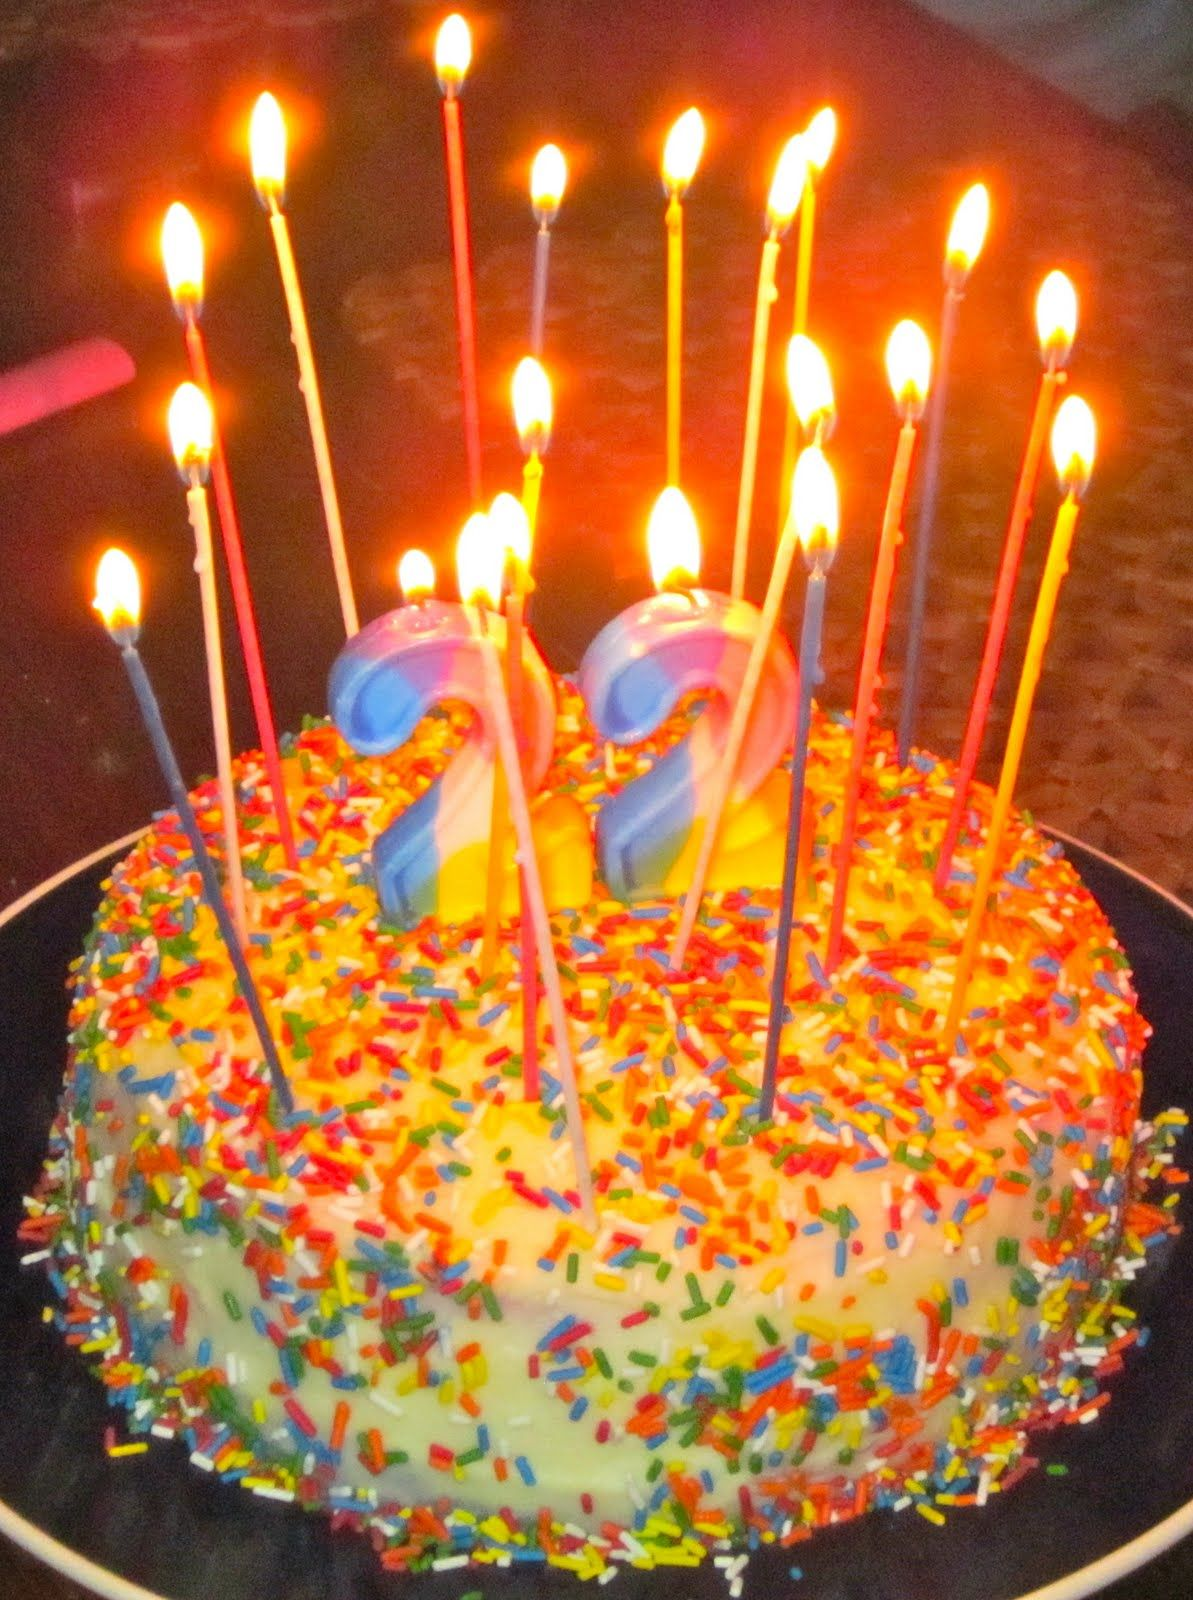 Birthday Cake With Candles 20 Nidhi Pinterest Birthday Cakes